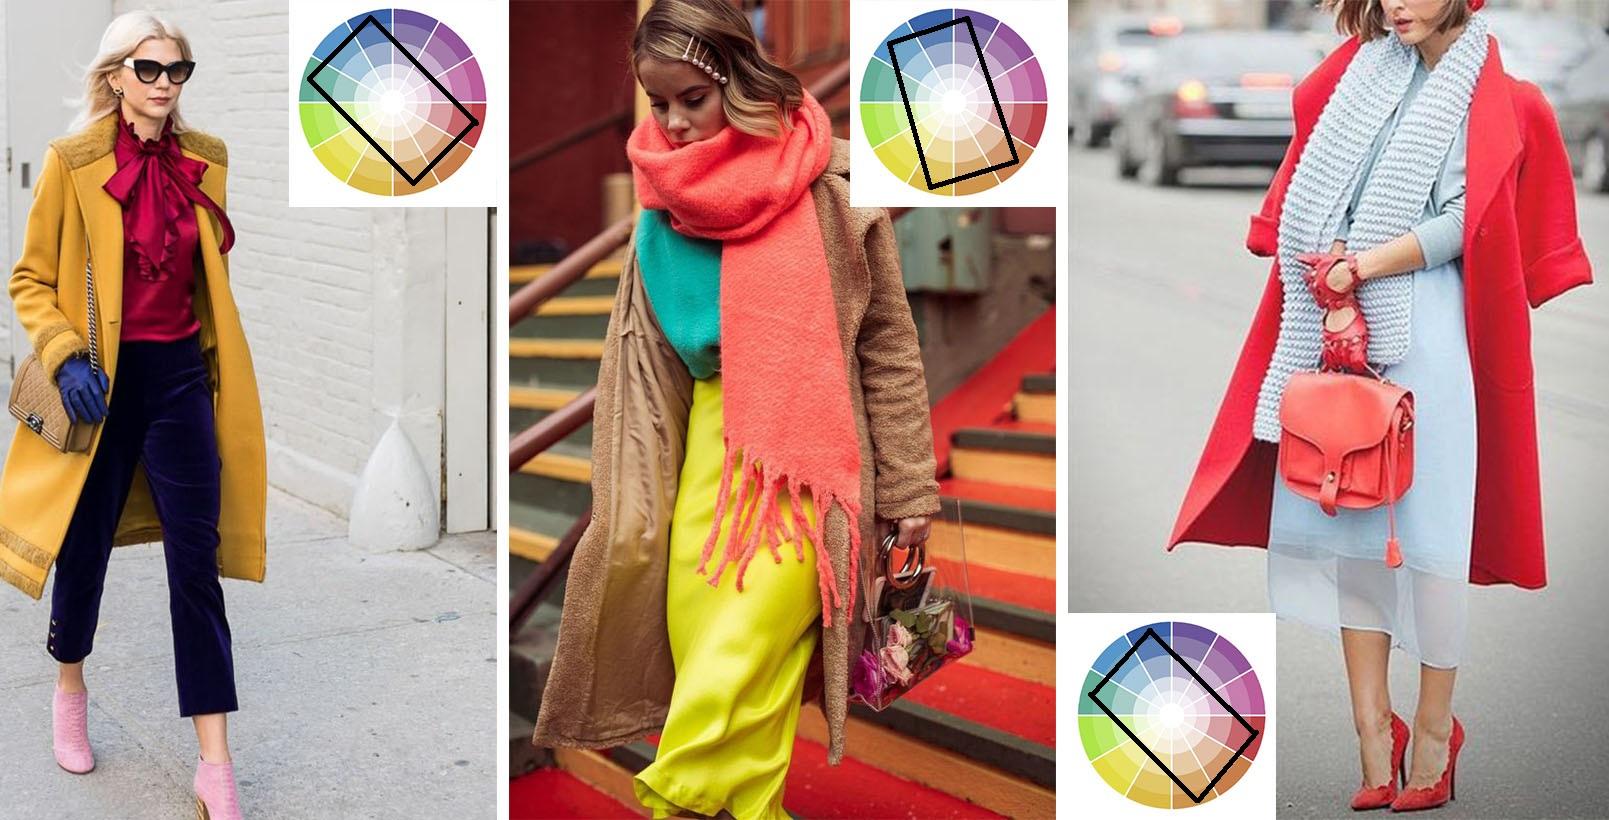 5 Reglas de color para lograr outfits asombrosos cada día